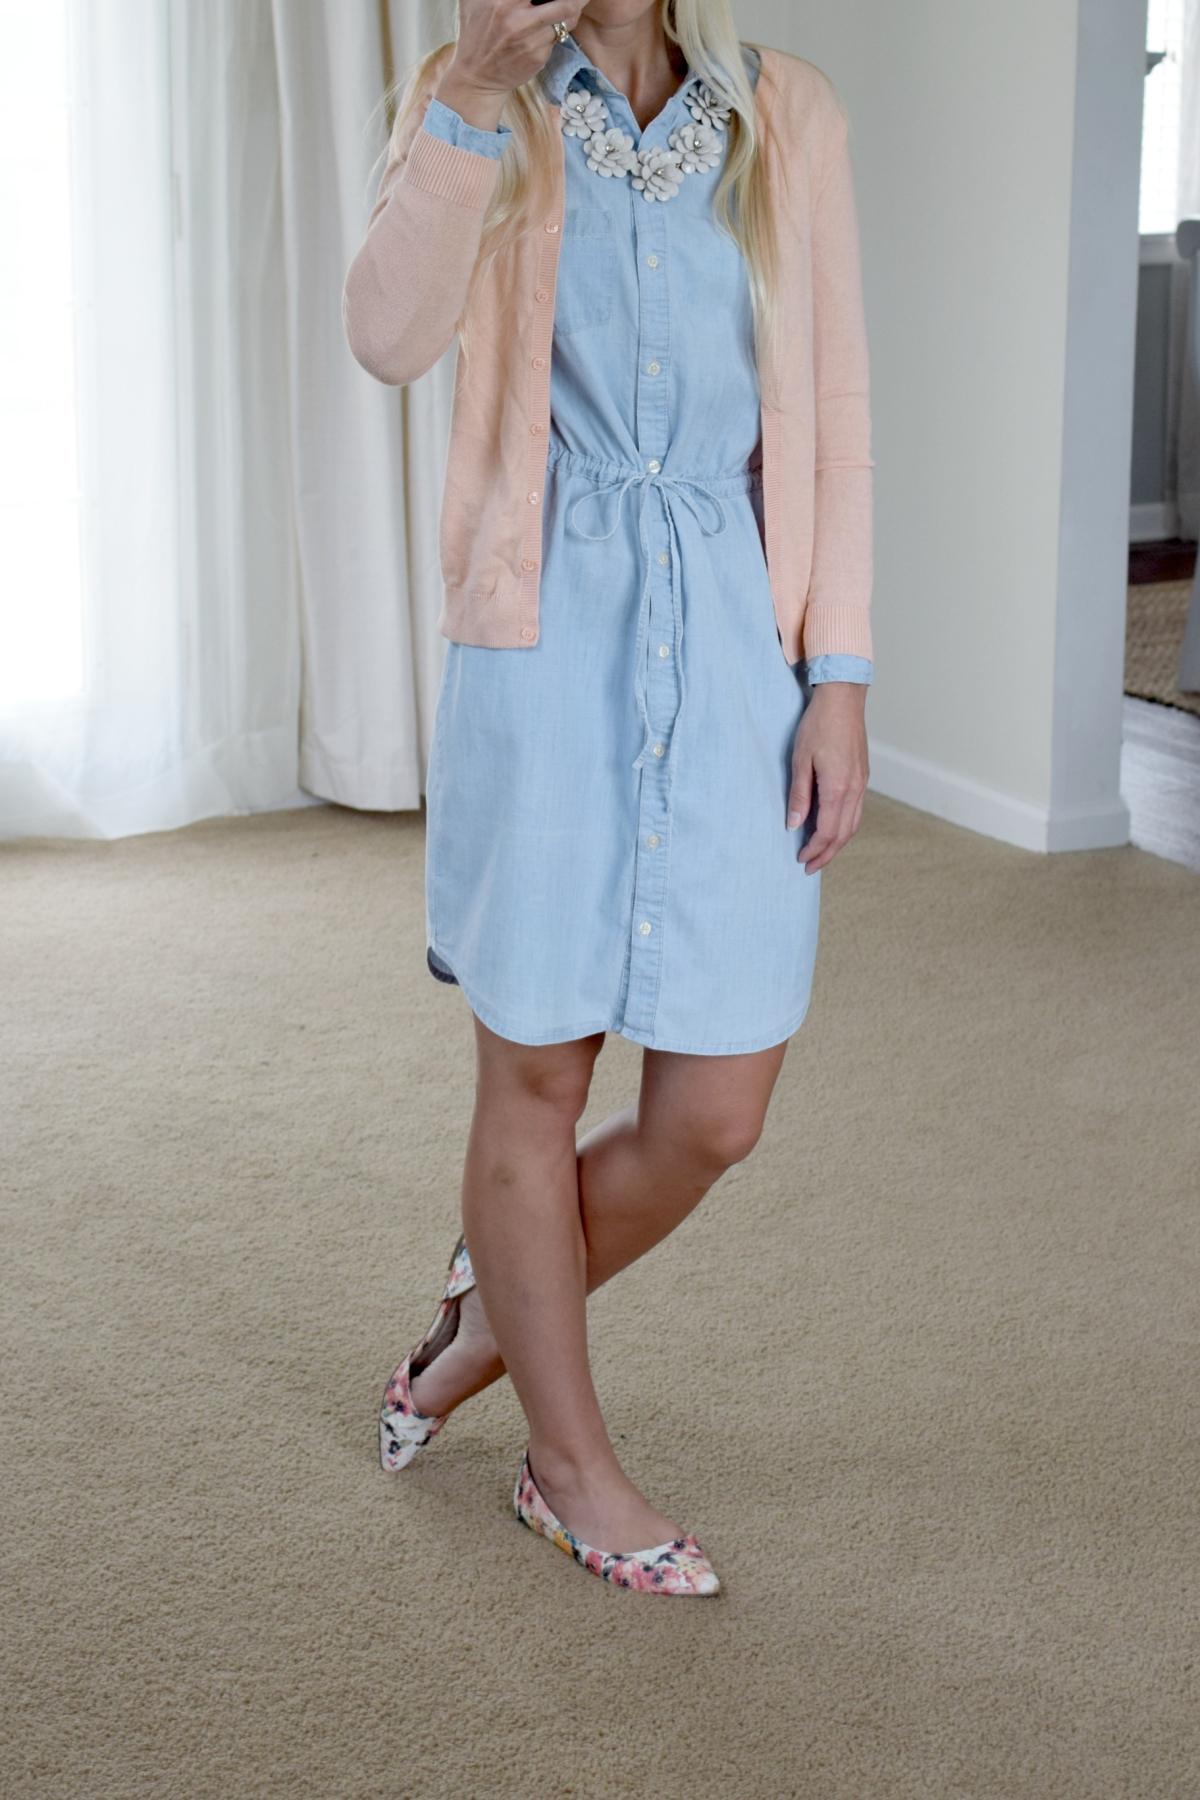 Chambray dress for spring |www.pearlsandsportsbras.com|